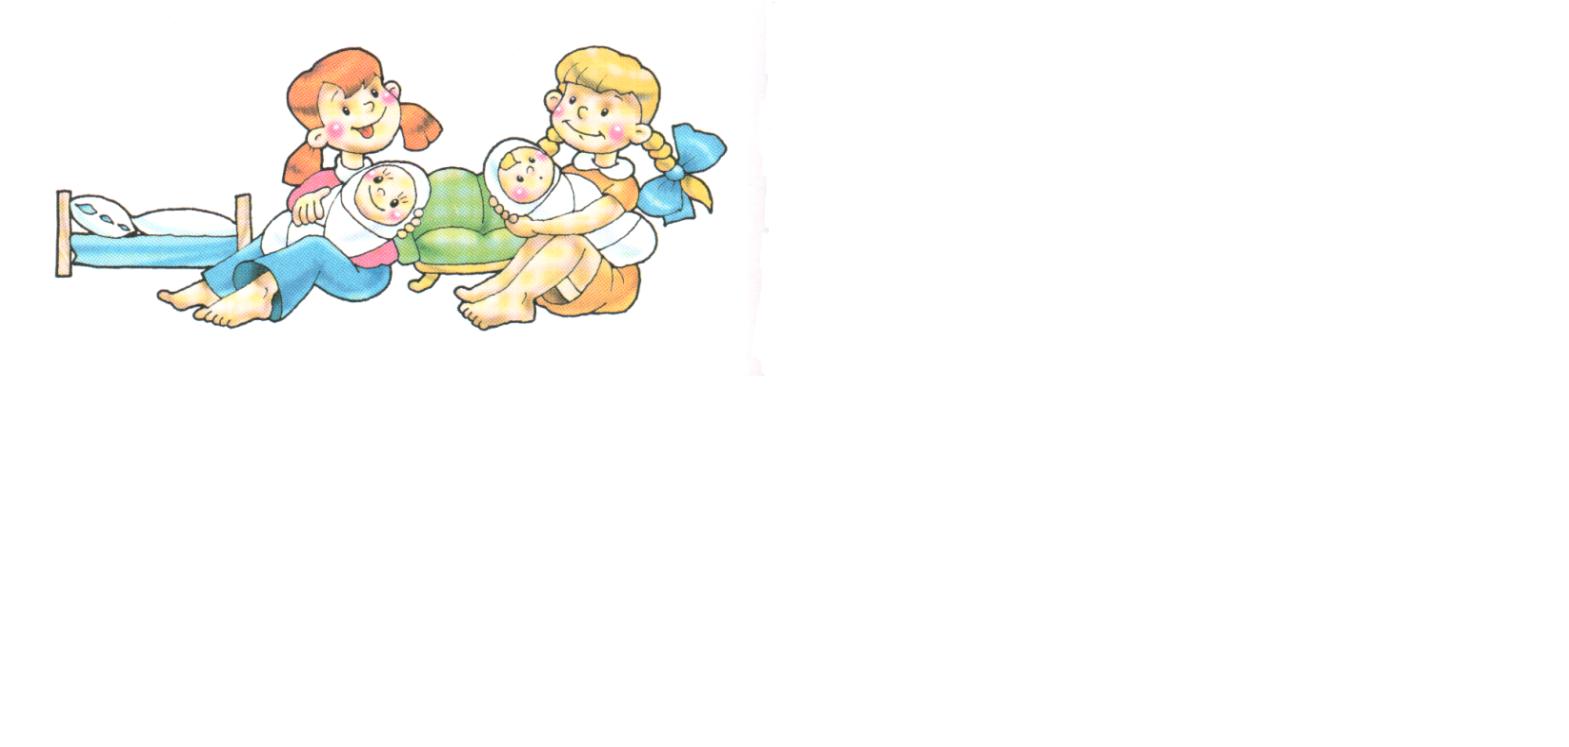 D:\Наталья\Наталья\1 класс\Найди букву\Девочки и куклы2.bmp